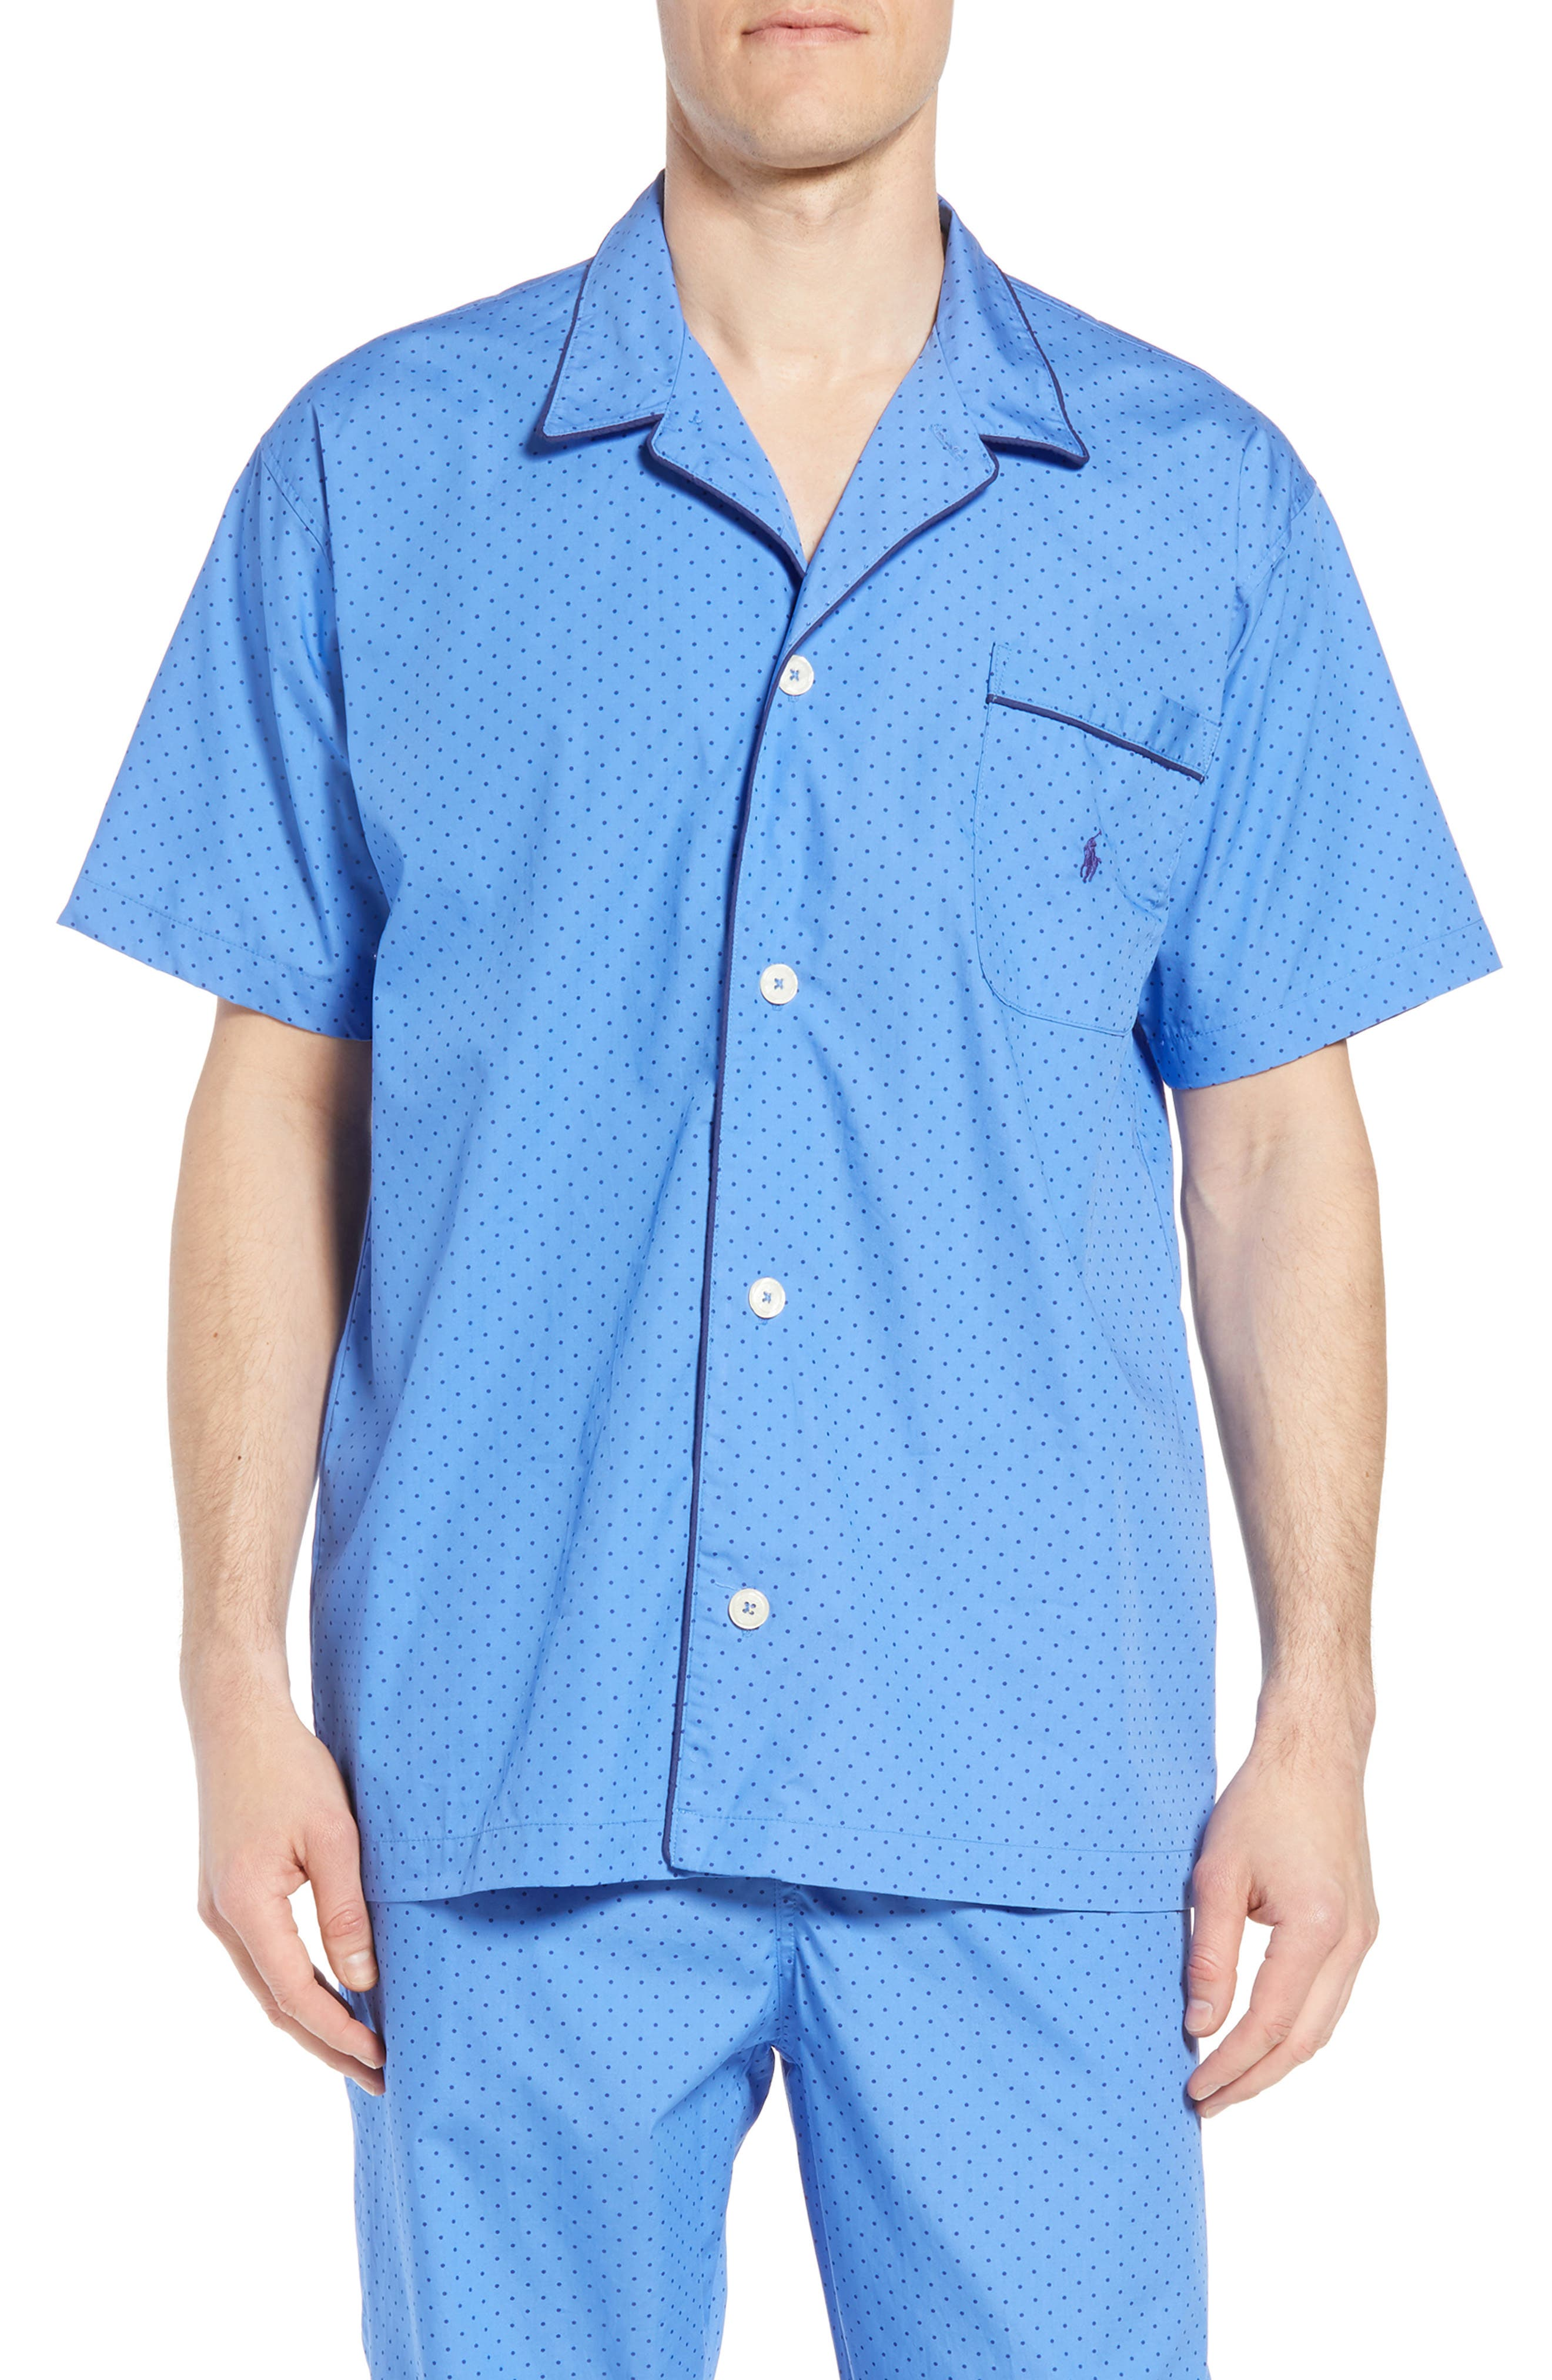 POLO RALPH LAUREN,                             Dot Cotton Pajama Shirt,                             Main thumbnail 1, color,                             451